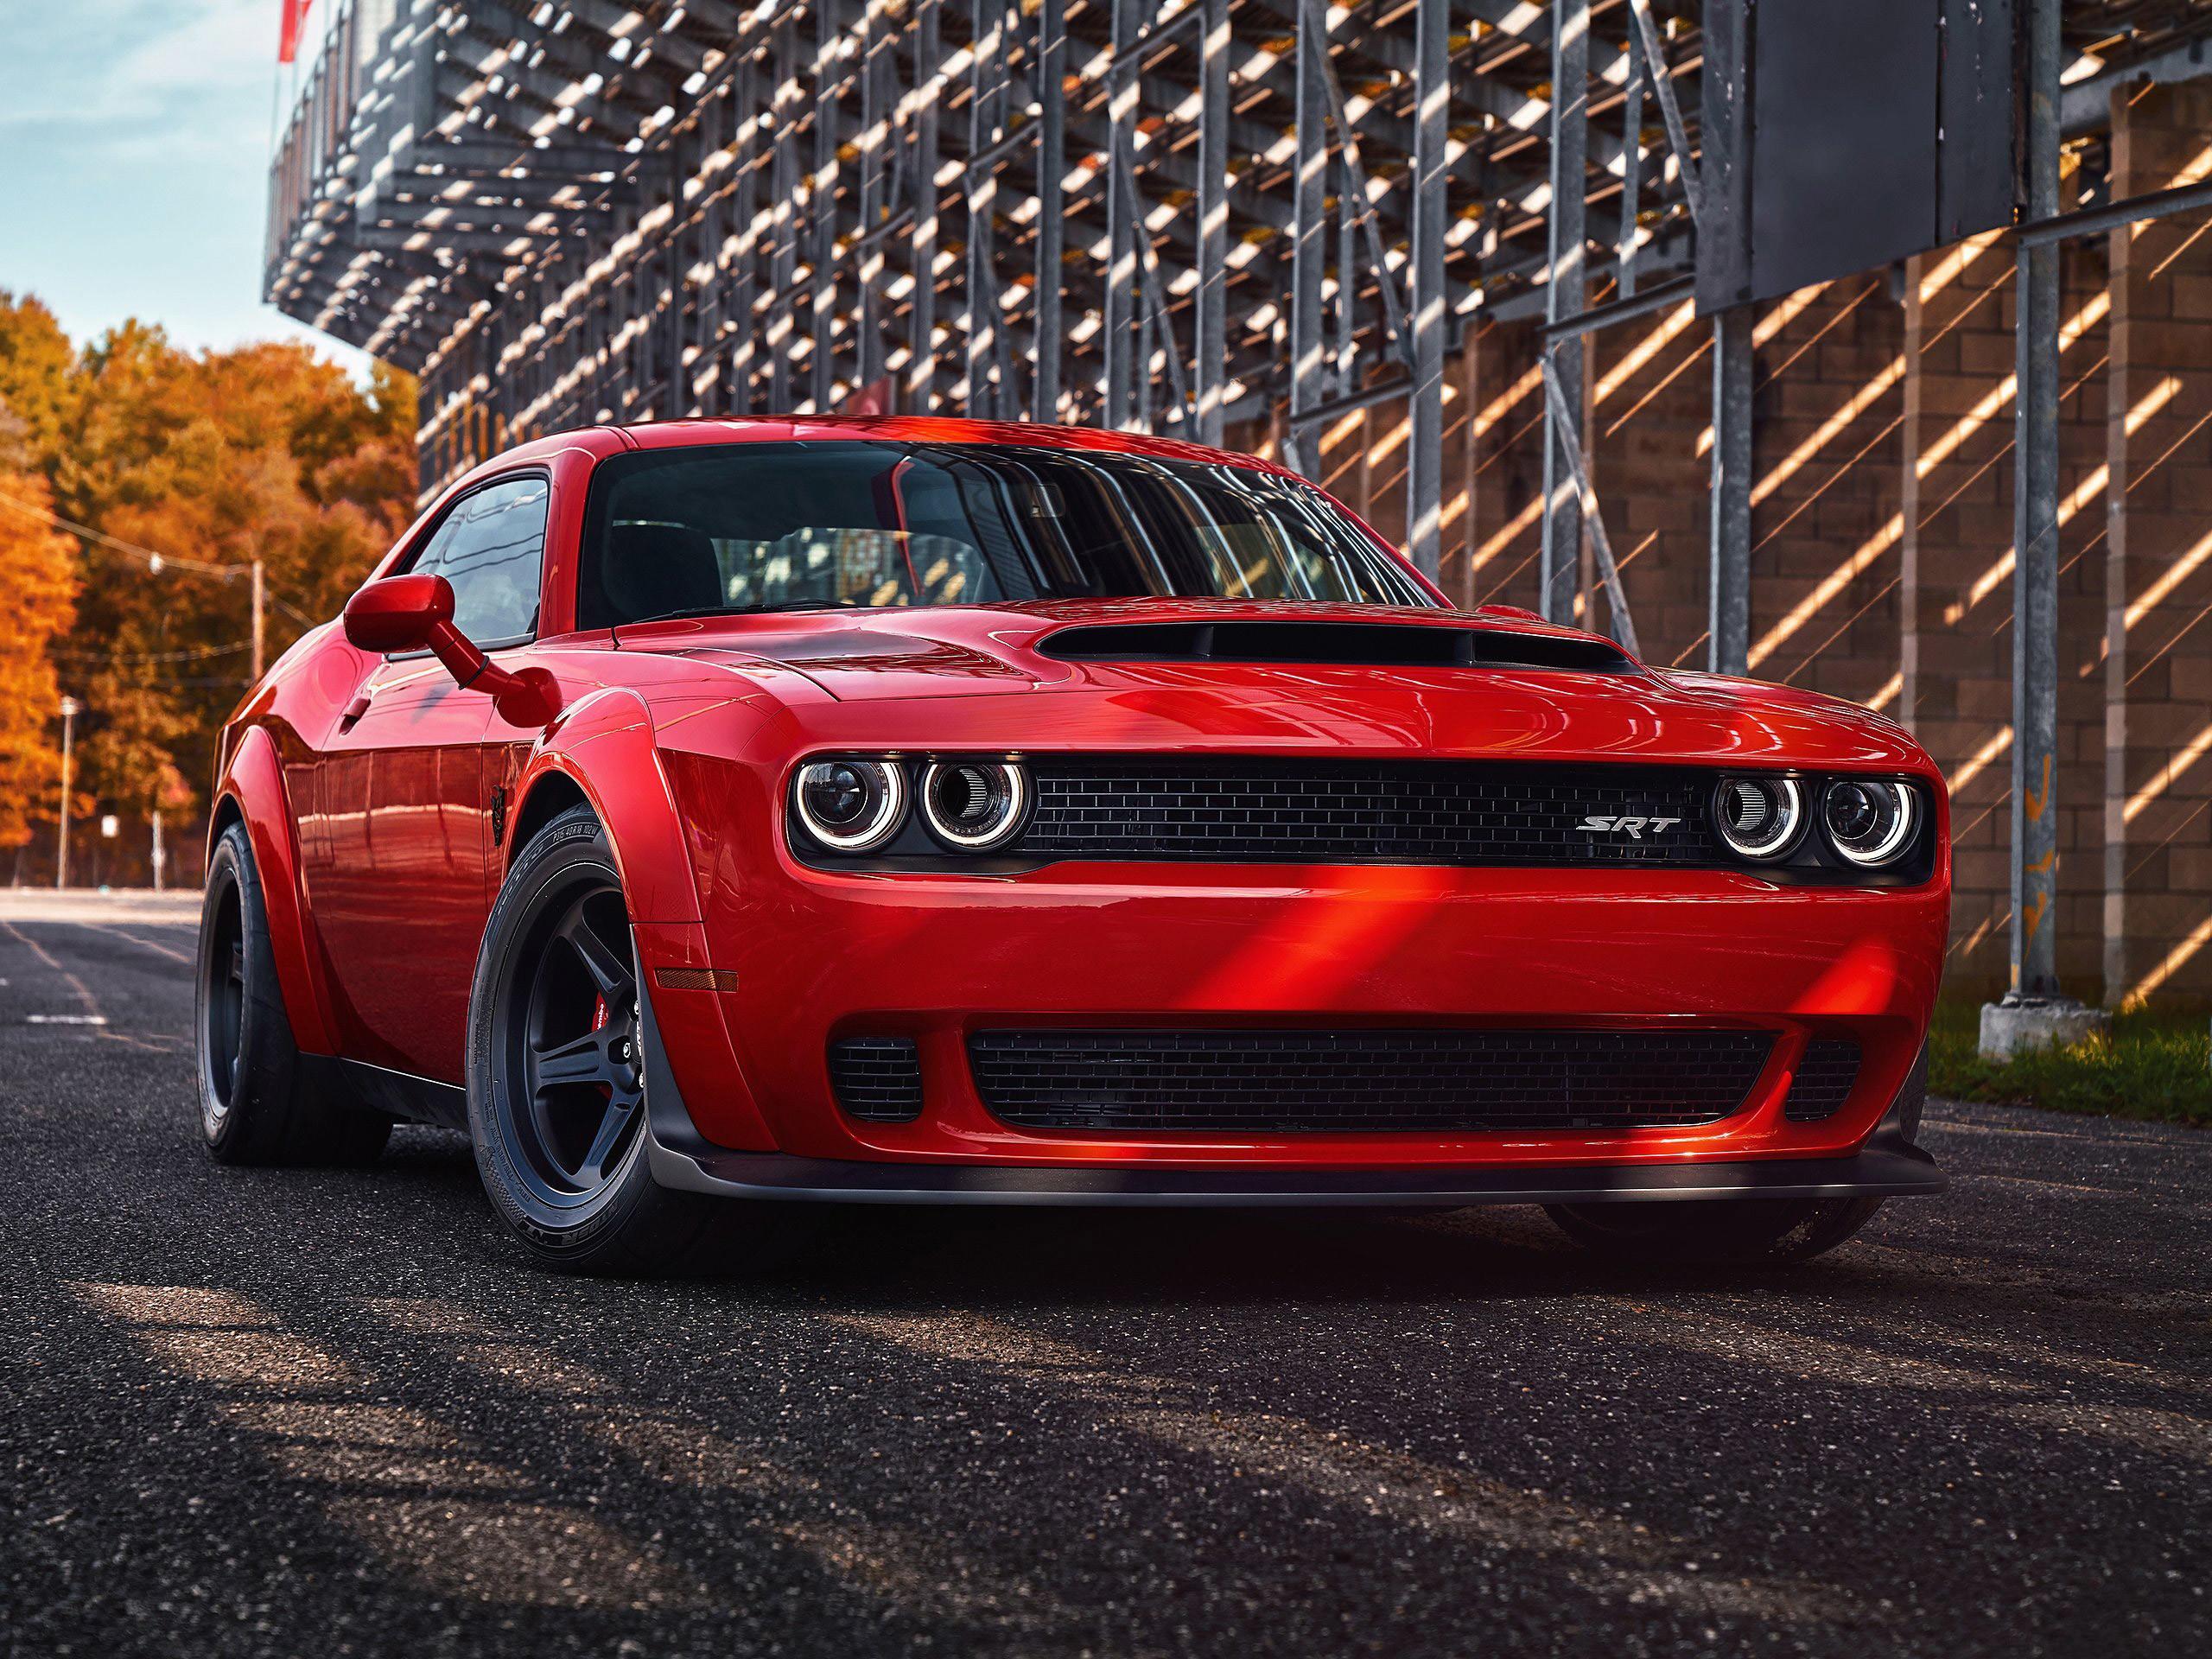 2018 Dodge Challenger Black Wallpapers Wallpapertag